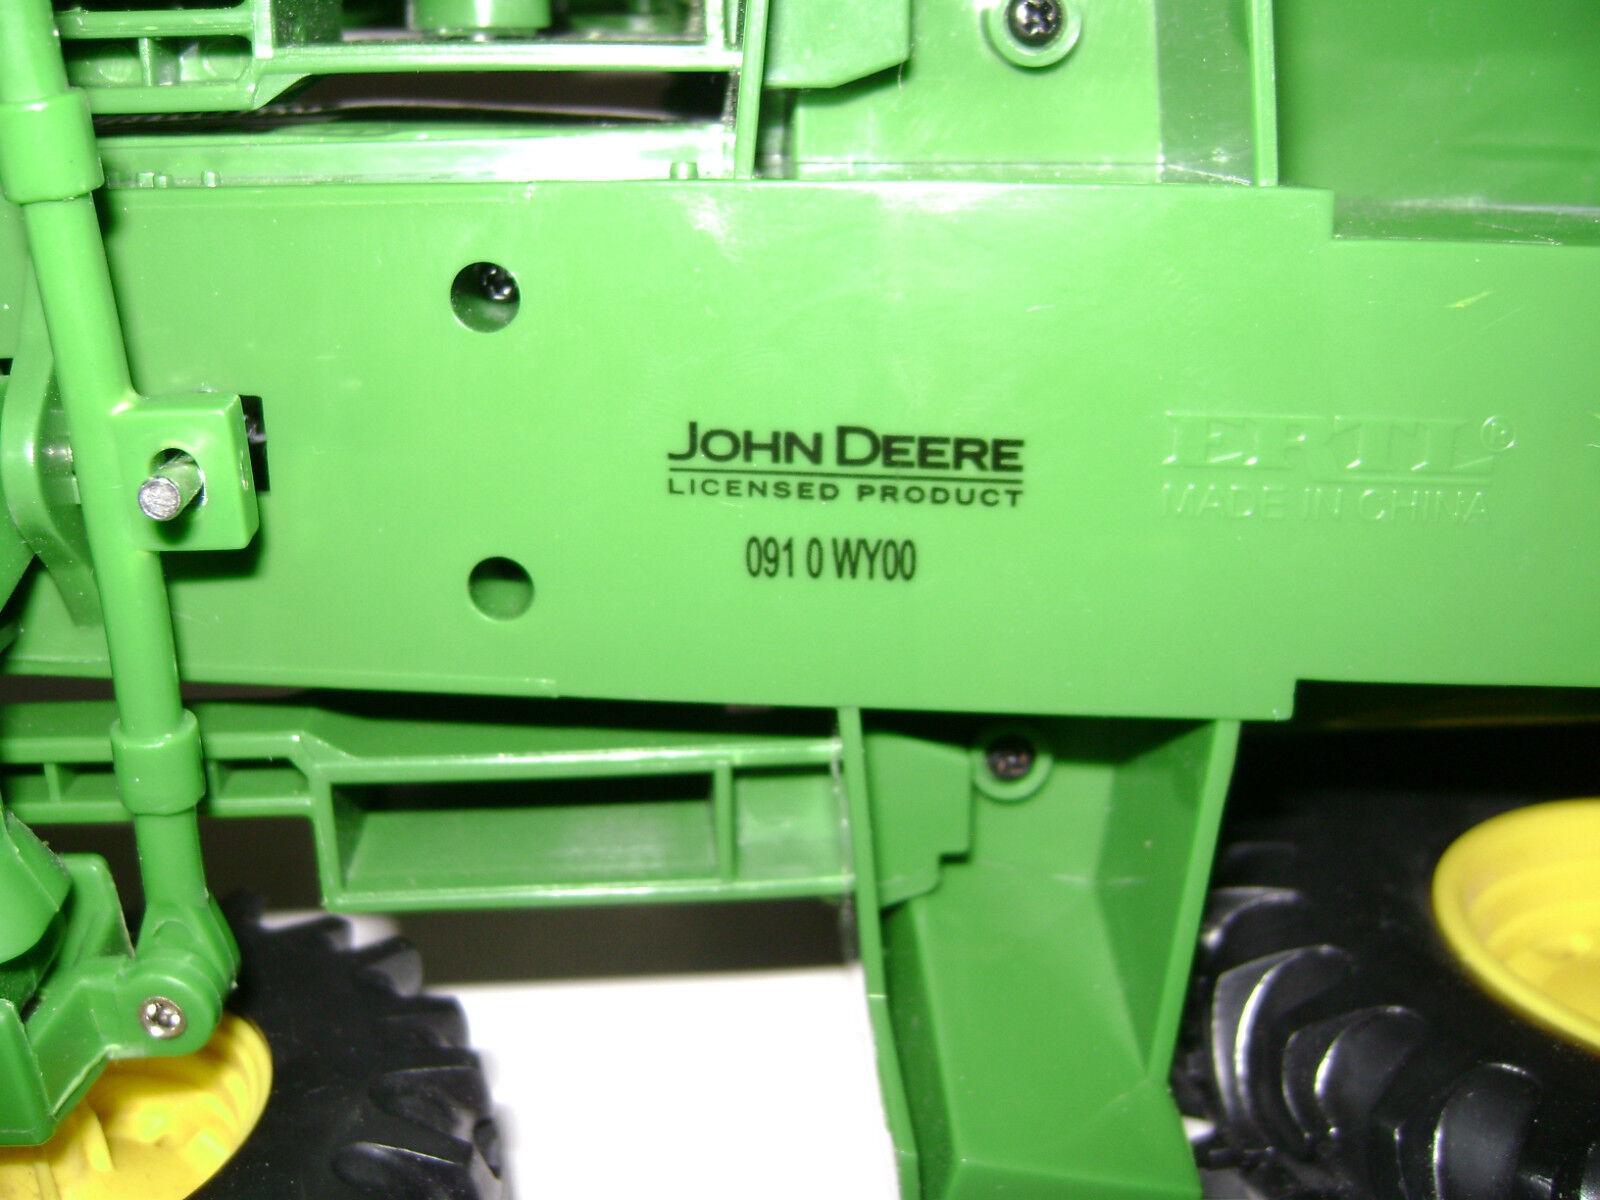 JOHM DEERE ERTL ERTL ERTL TRACTOR 8  x 11  W removable FRONT LOADER 8  x 16  da812b